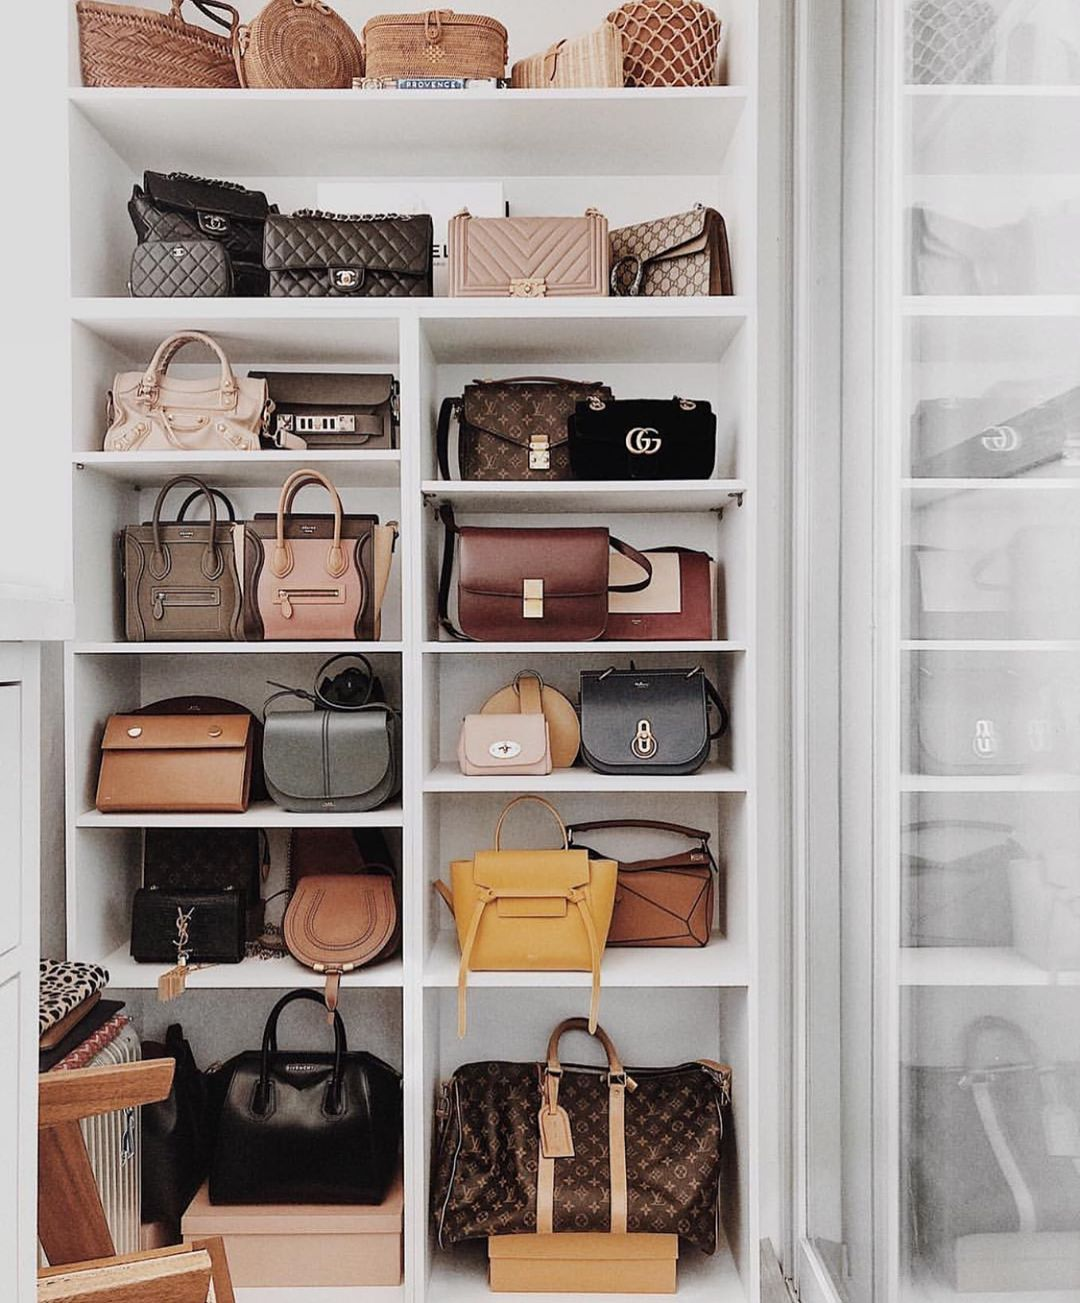 Purseblog On Instagram Serious Closet Goals Via Nyctoparis Which Bag Would You Pick If You Could Only Closet Decor Bedroom Closet Design Dream Closet Design